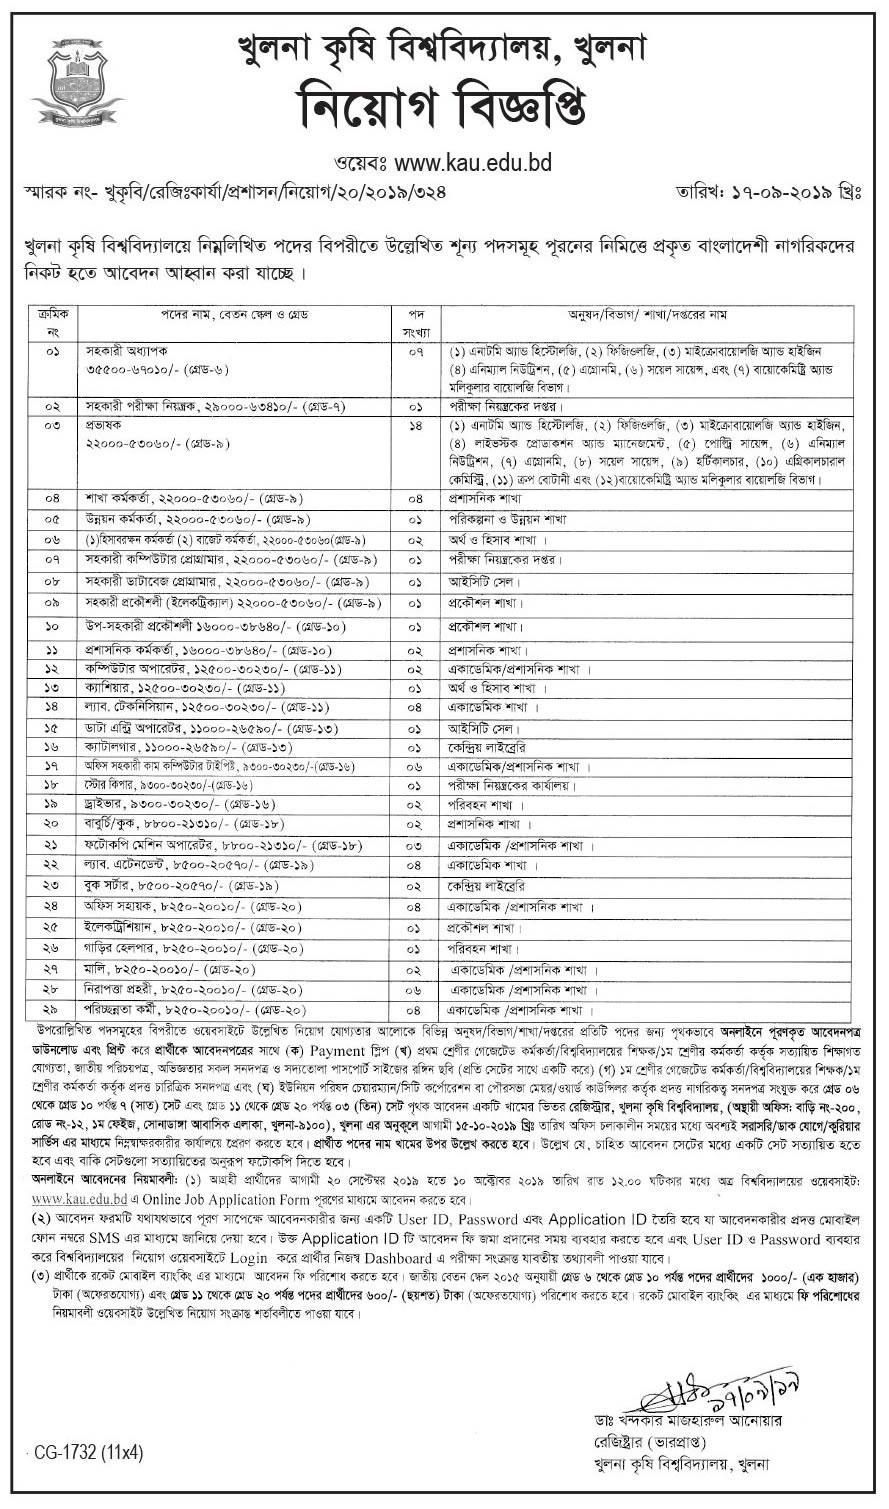 Khulna Agricultural University Job Circular 2019